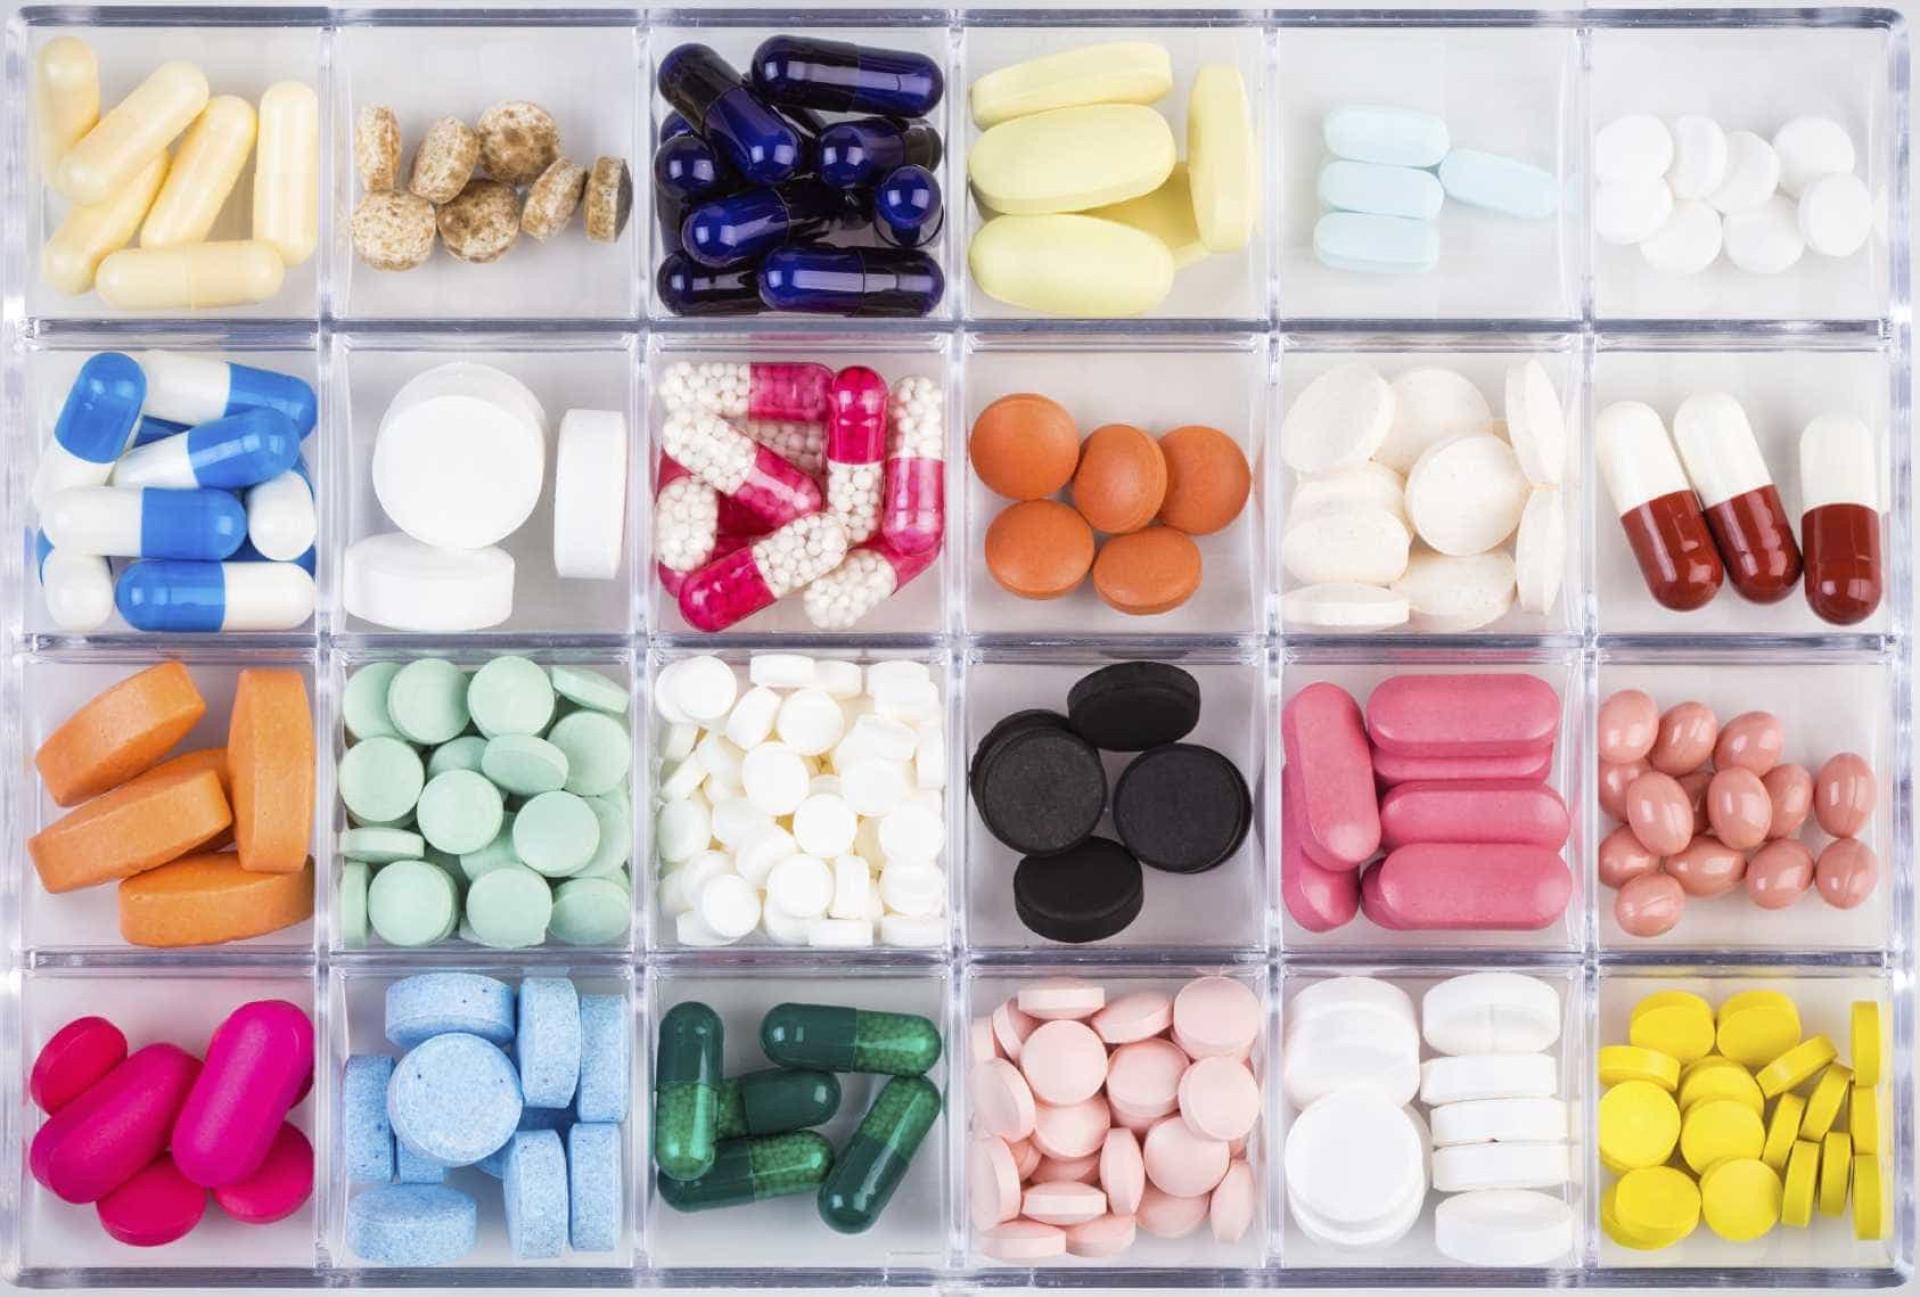 Mitos e verdades sobre a validade dos medicamentos